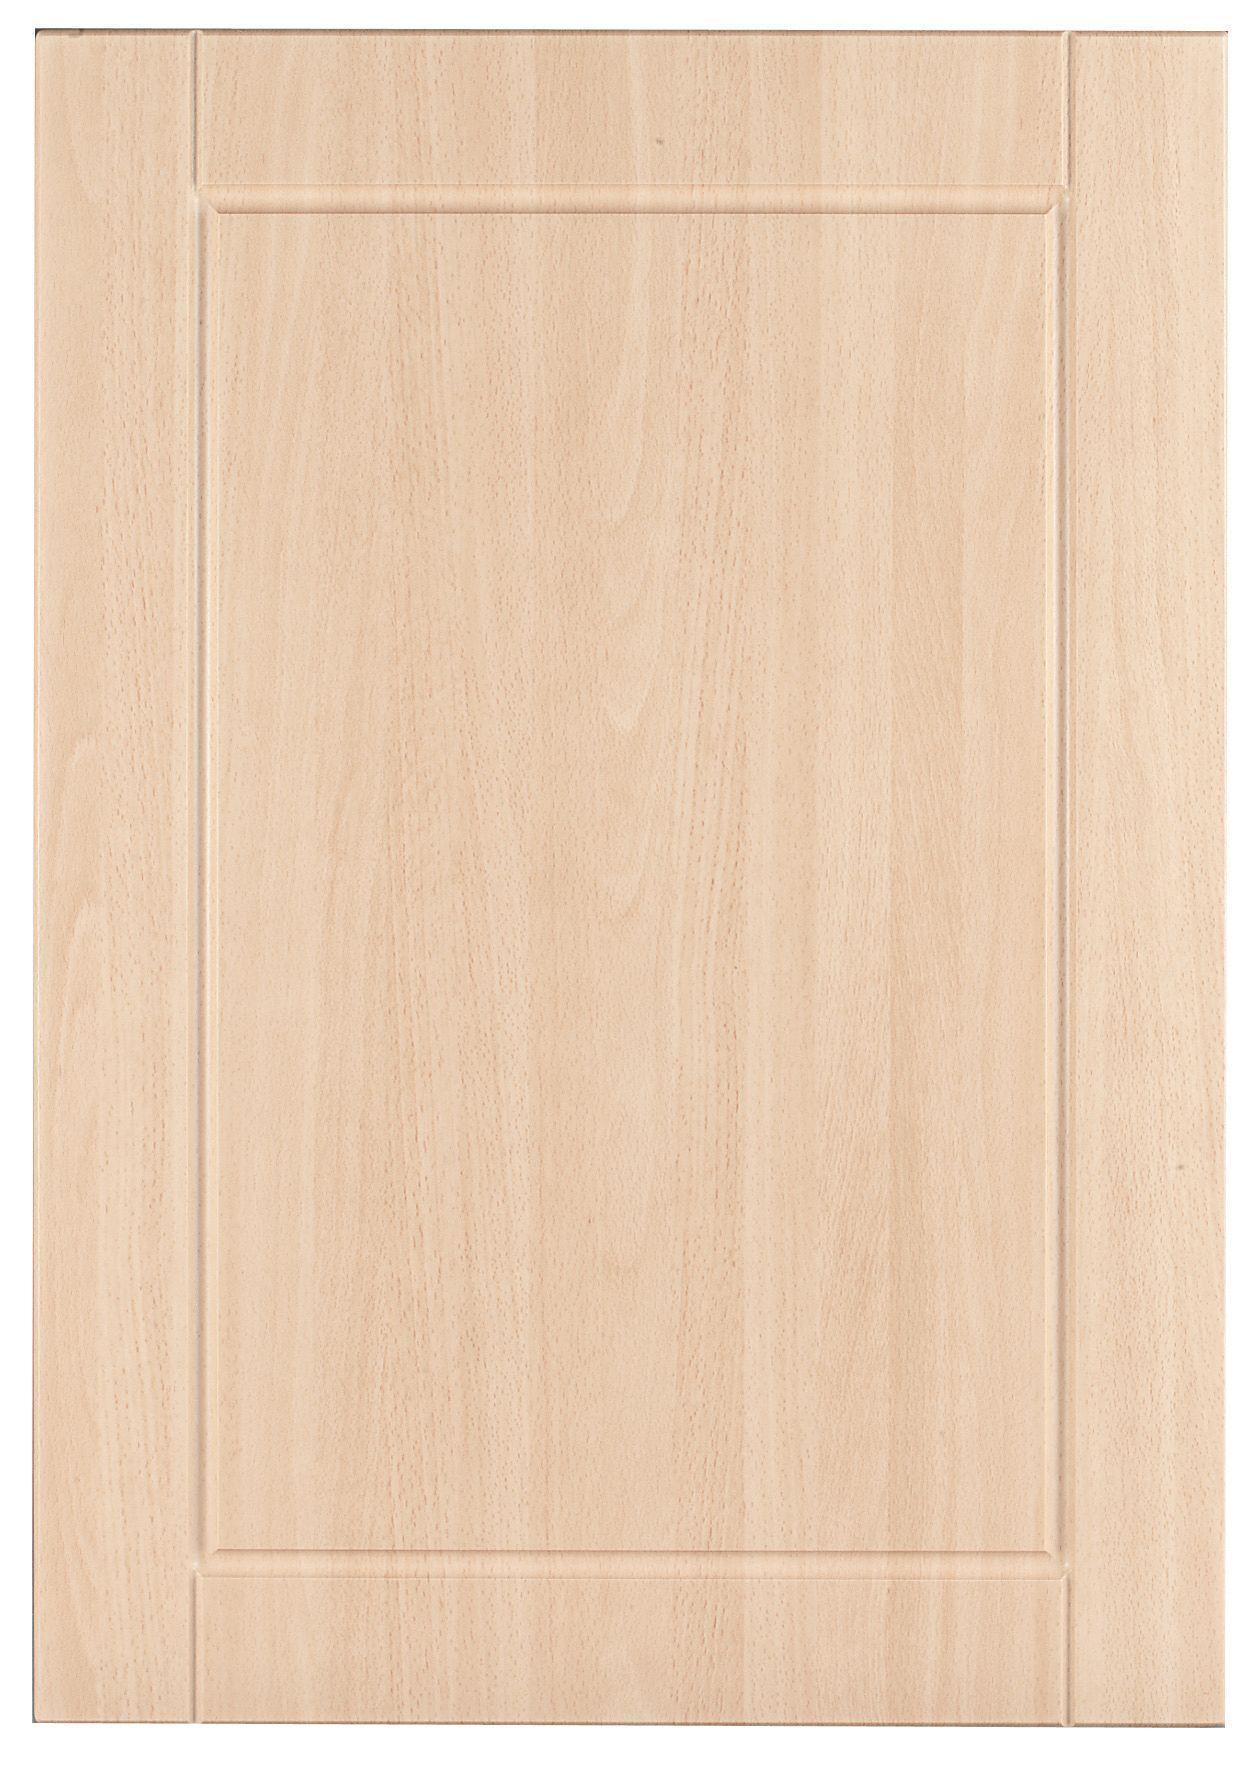 It Kitchens Chilton Beech Effect Standard Door W 500mm Departments Diy At B Q Beech Chilton Doors